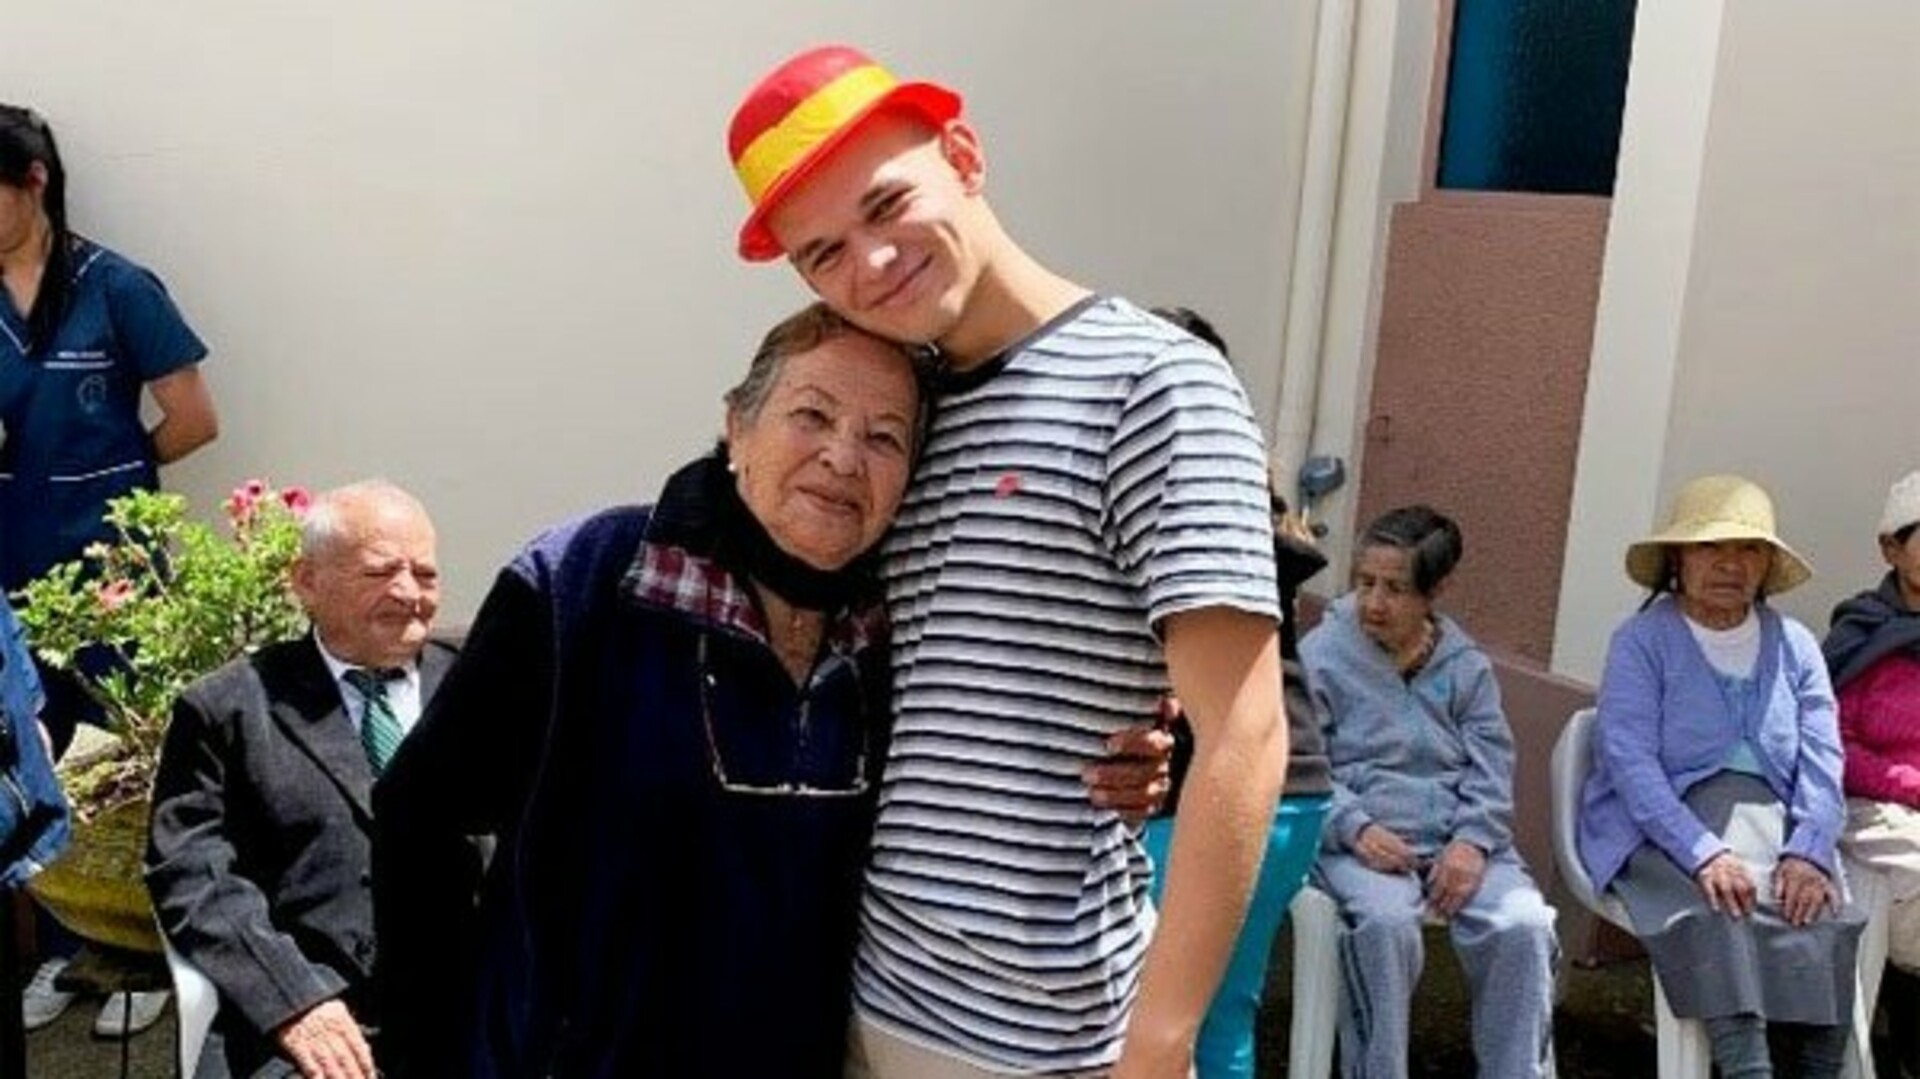 ODI weltwärts Freiwilligendienst Ecuador